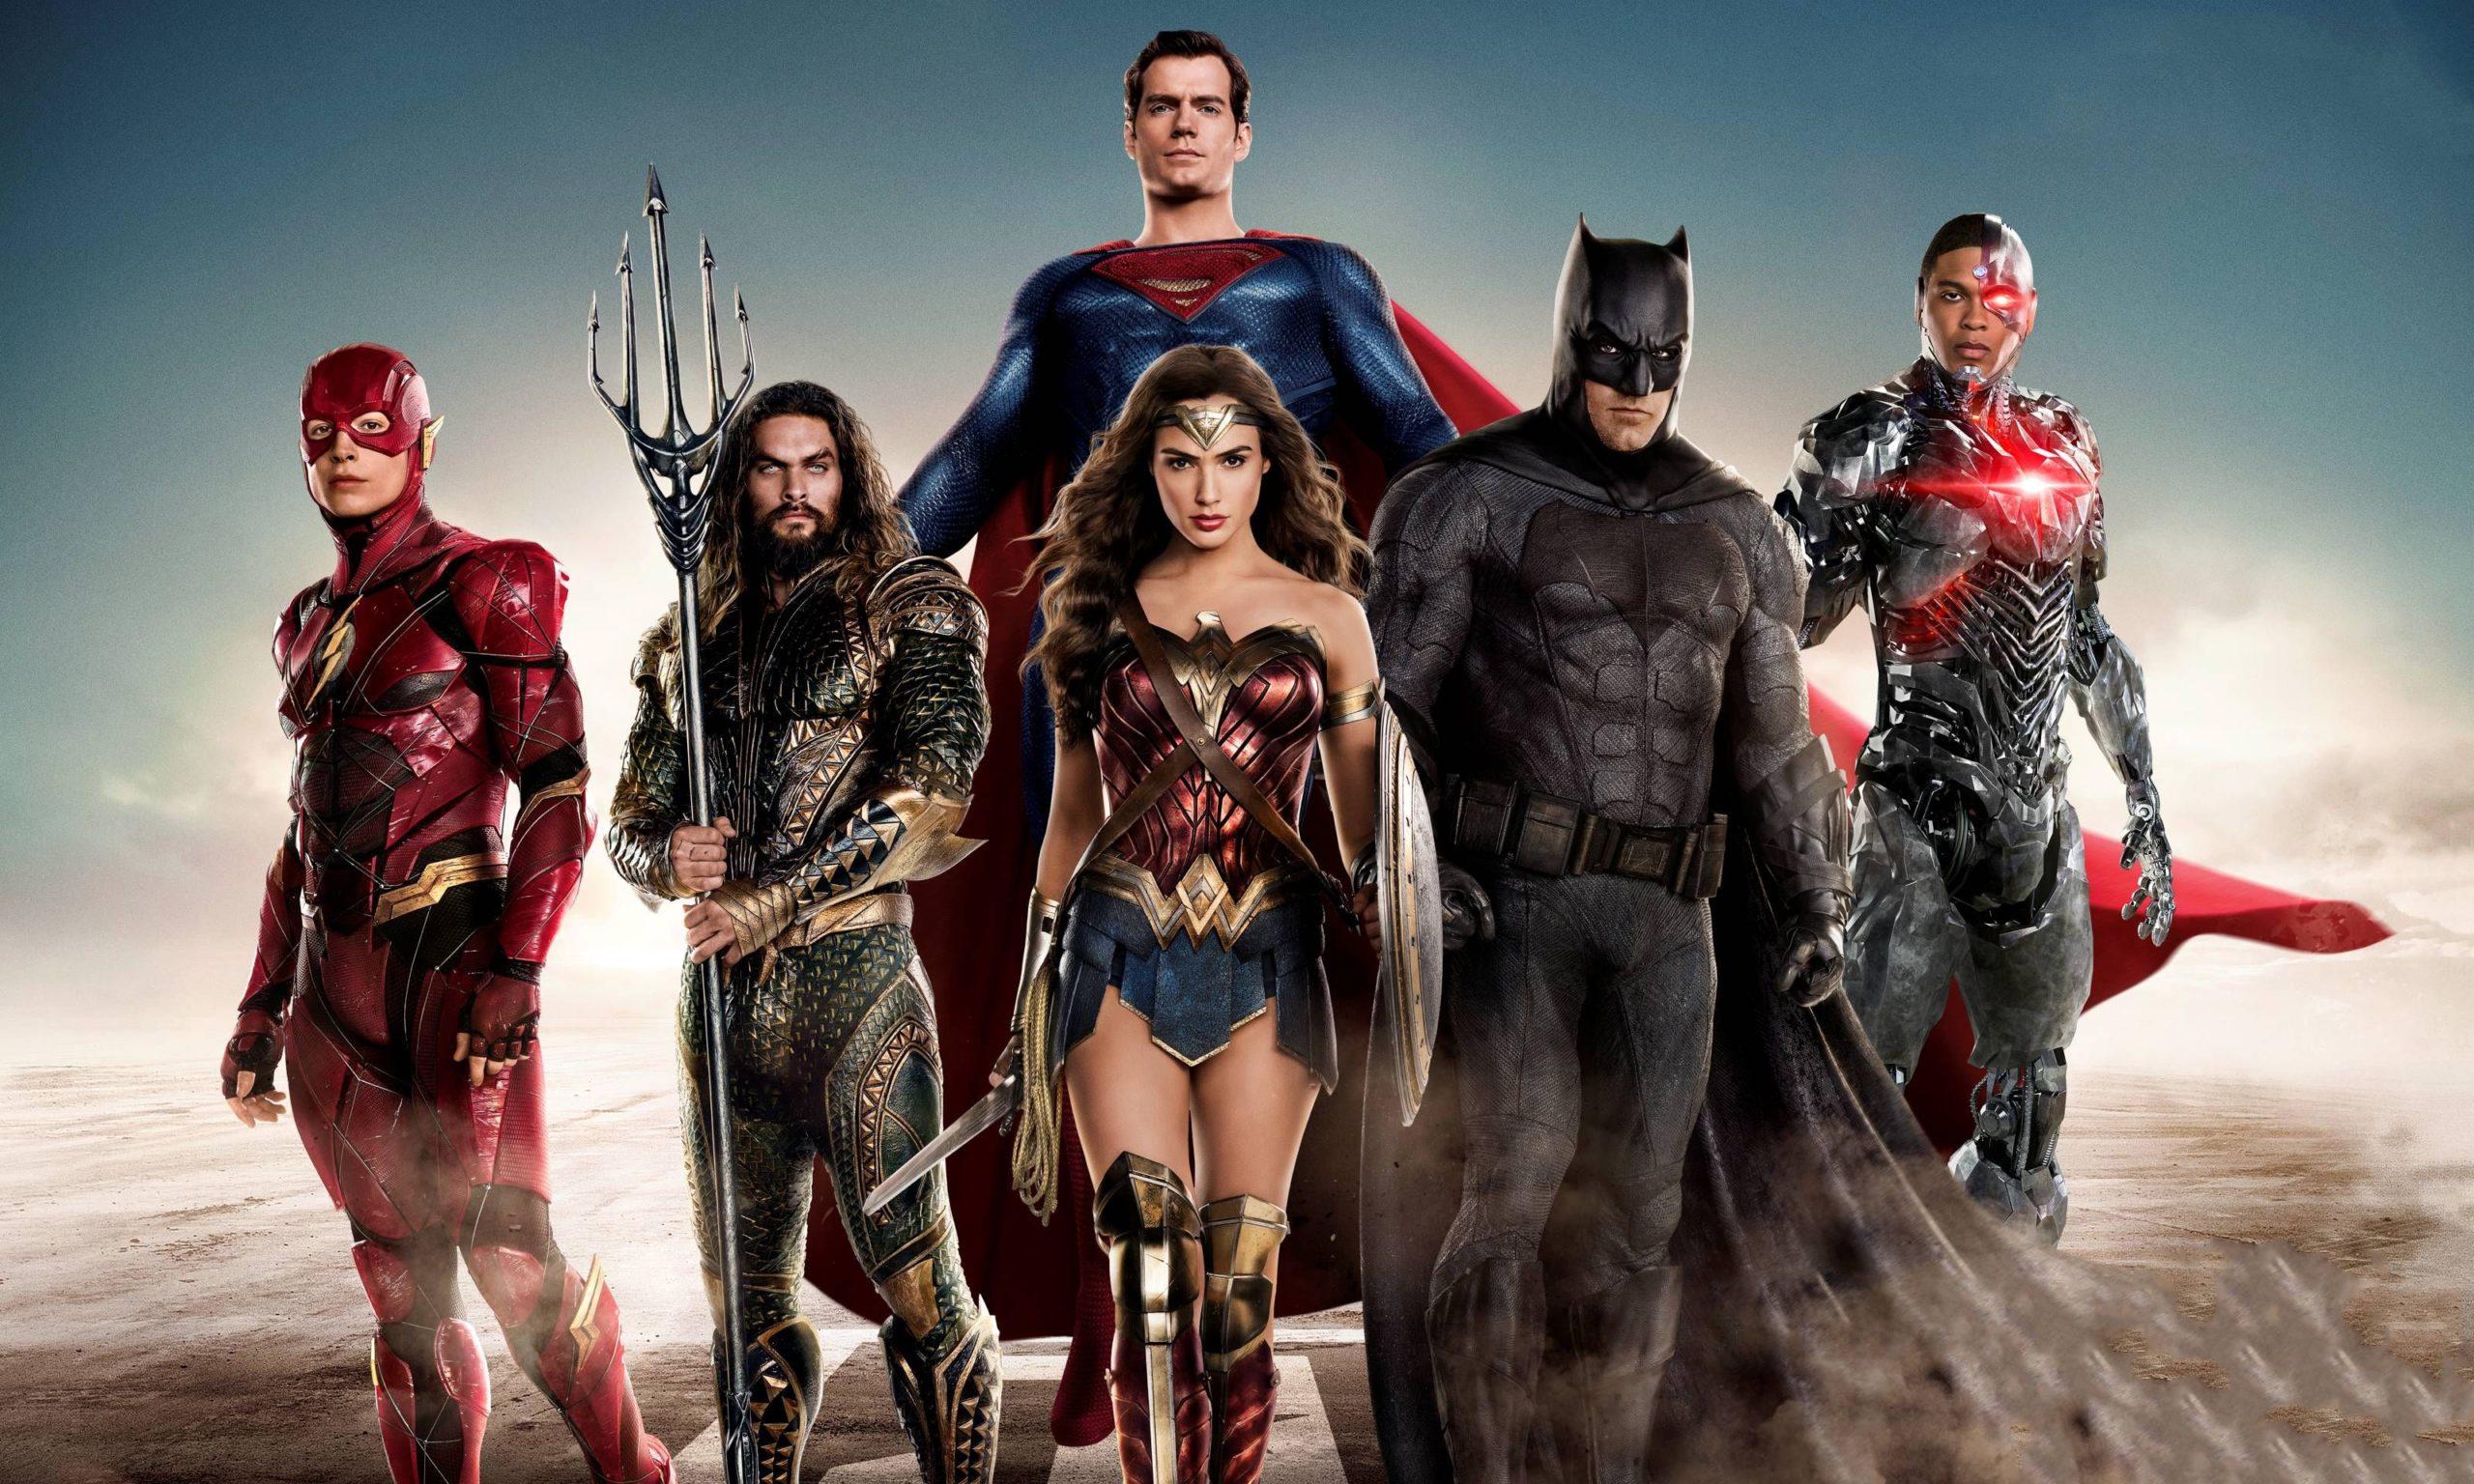 justice league background